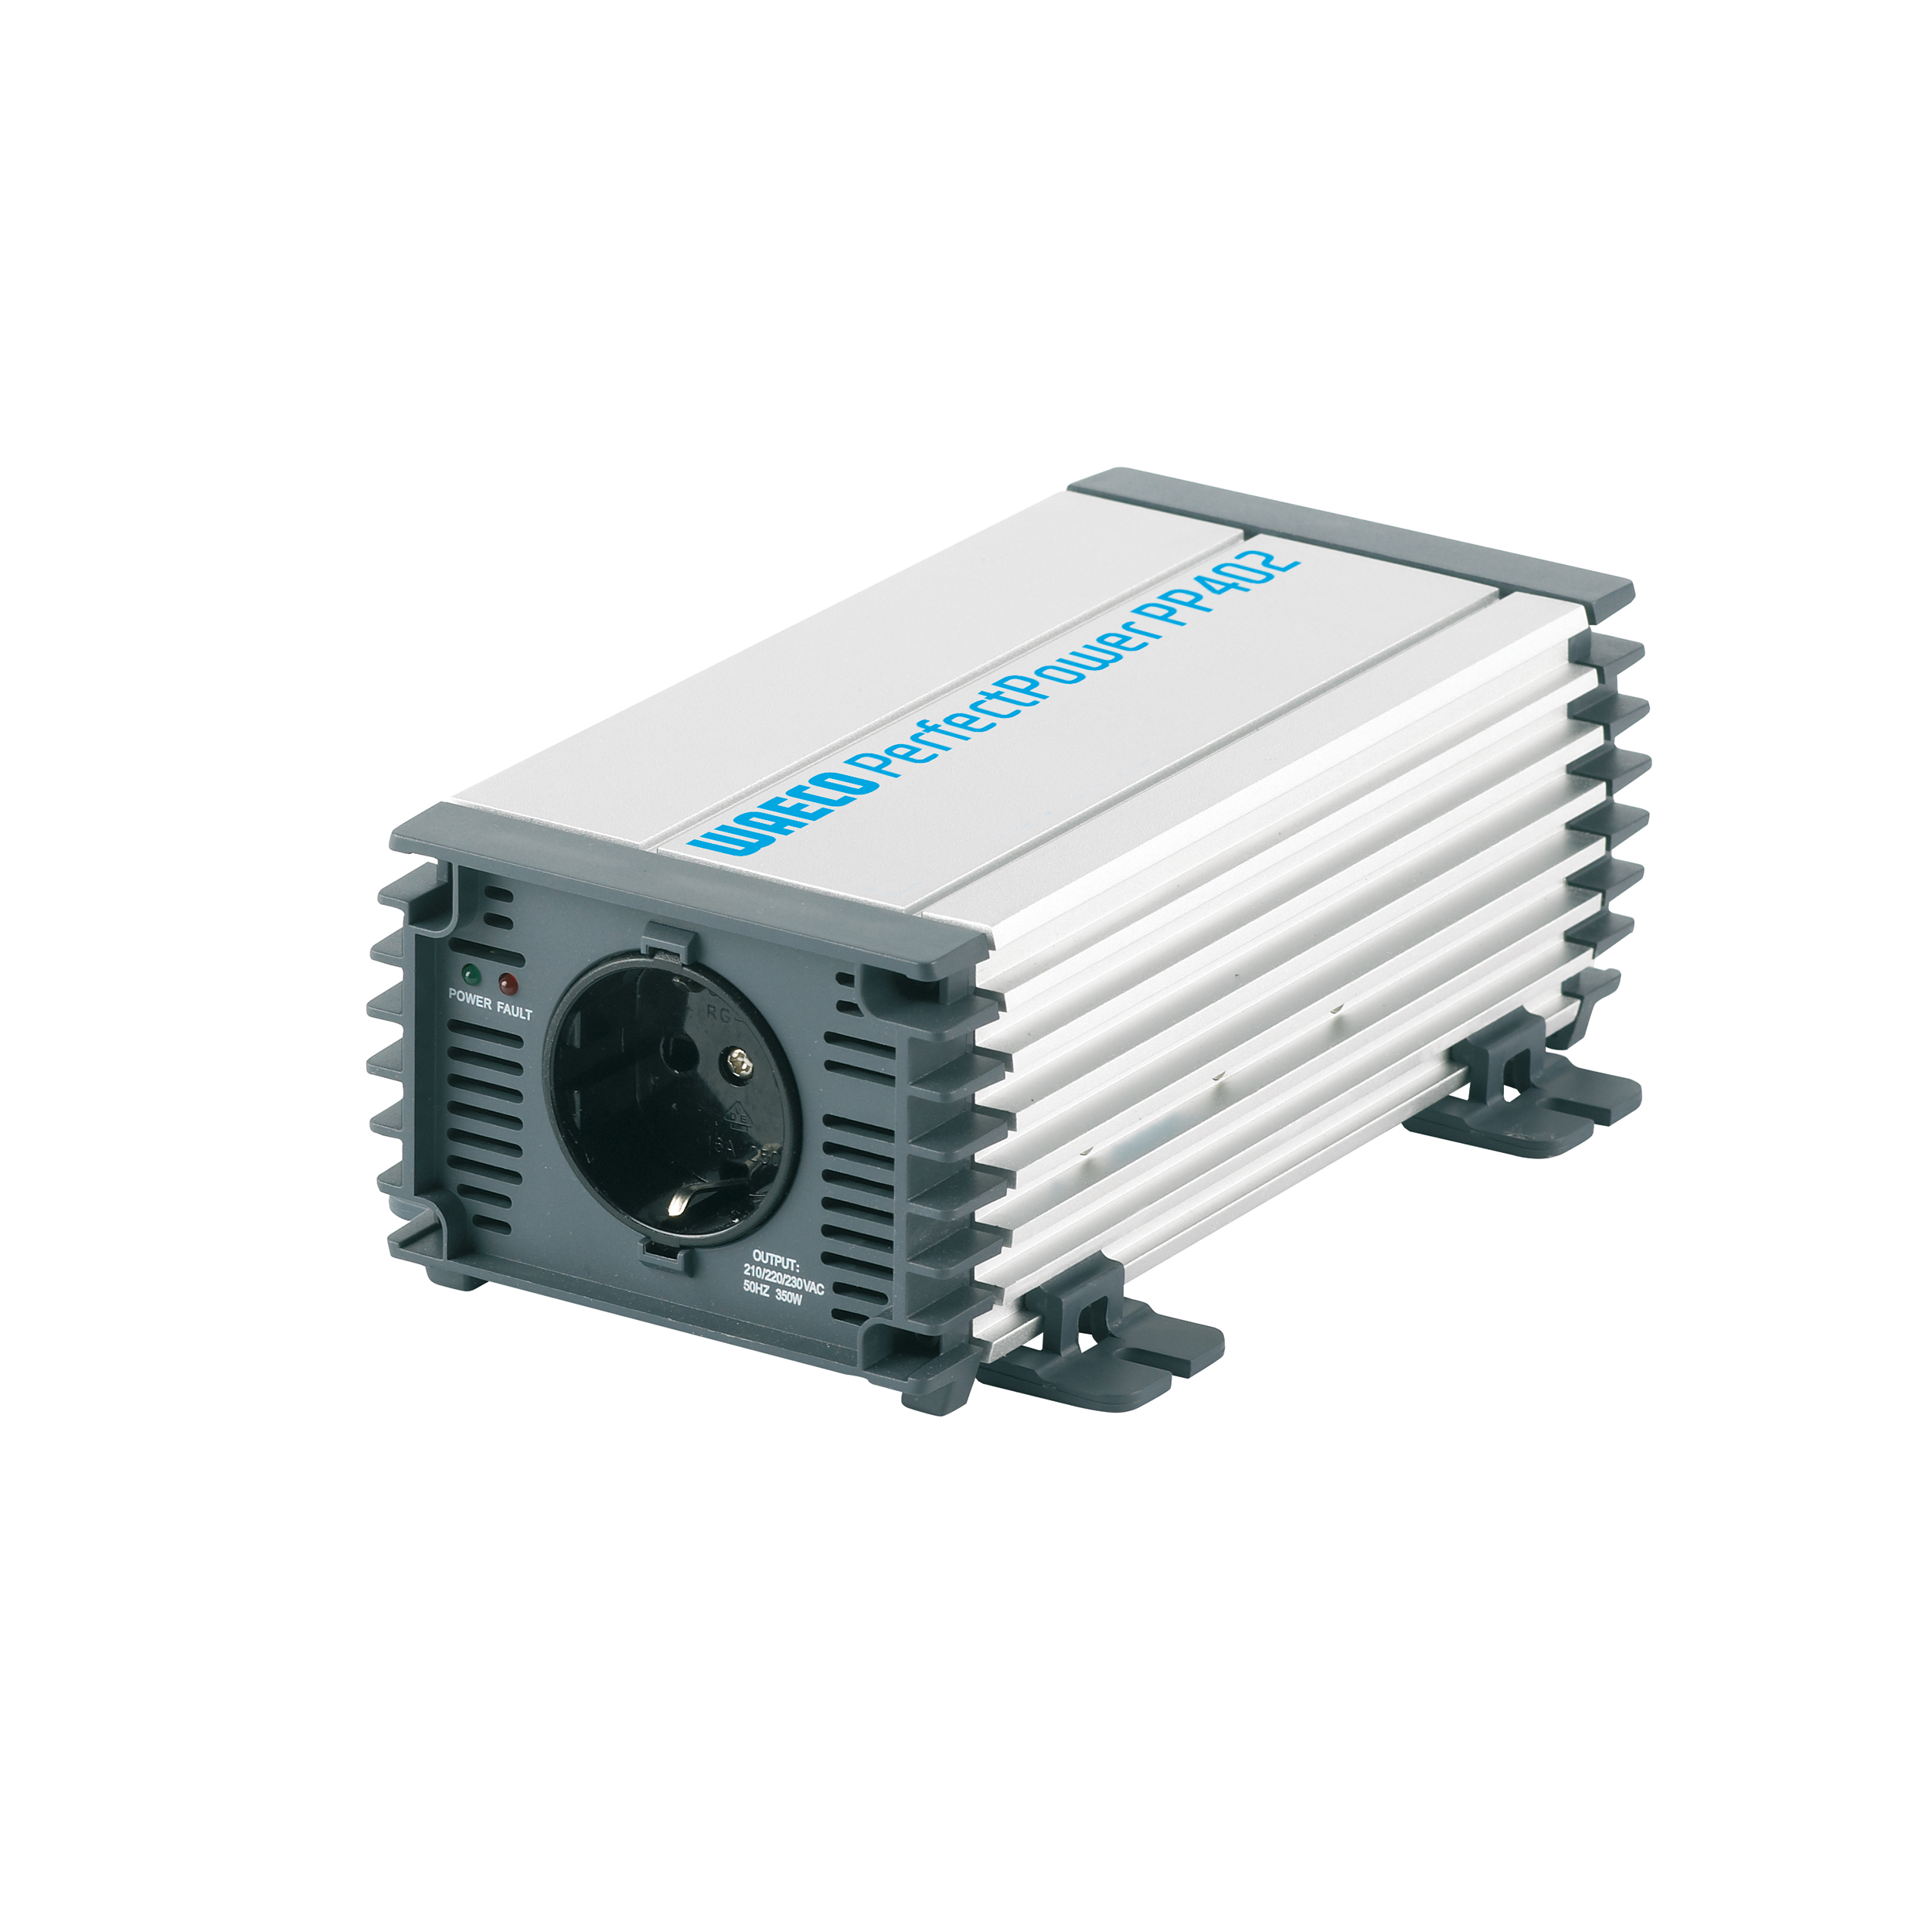 0350 w - 24 v waeco perfectpower pp 404 wechselrichter .. - dometic